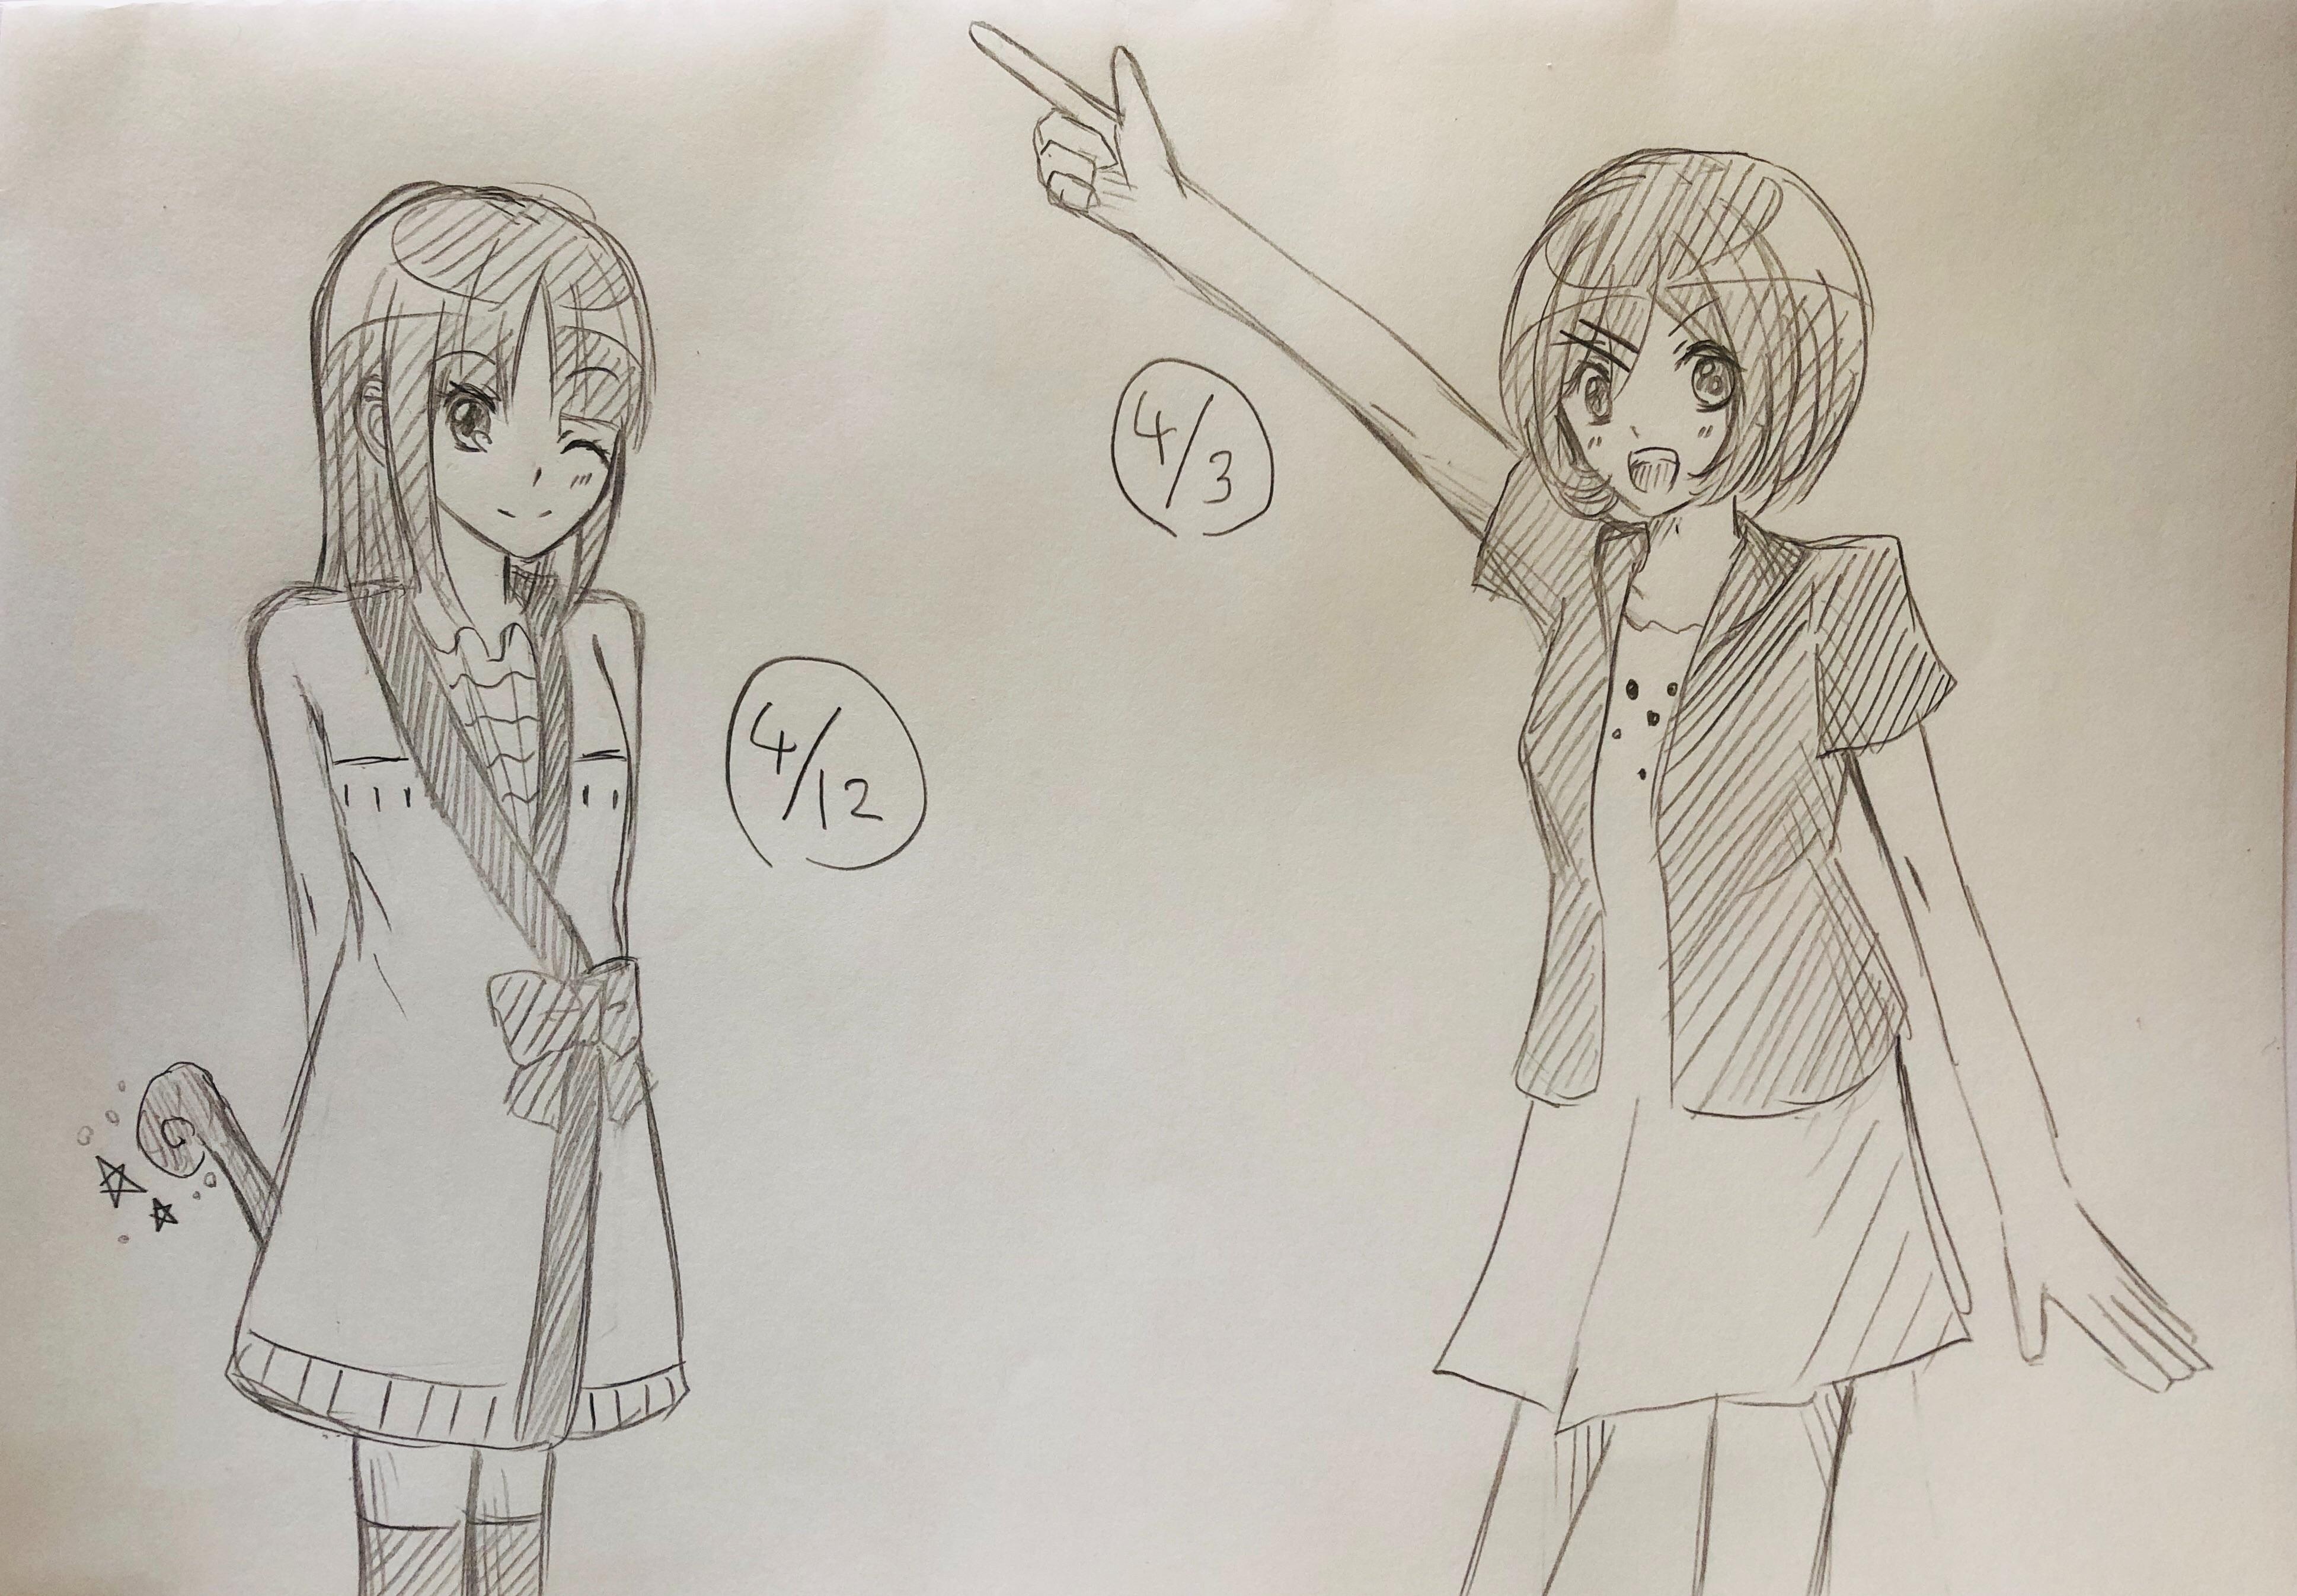 f:id:Yuki-19:20200407094425j:image